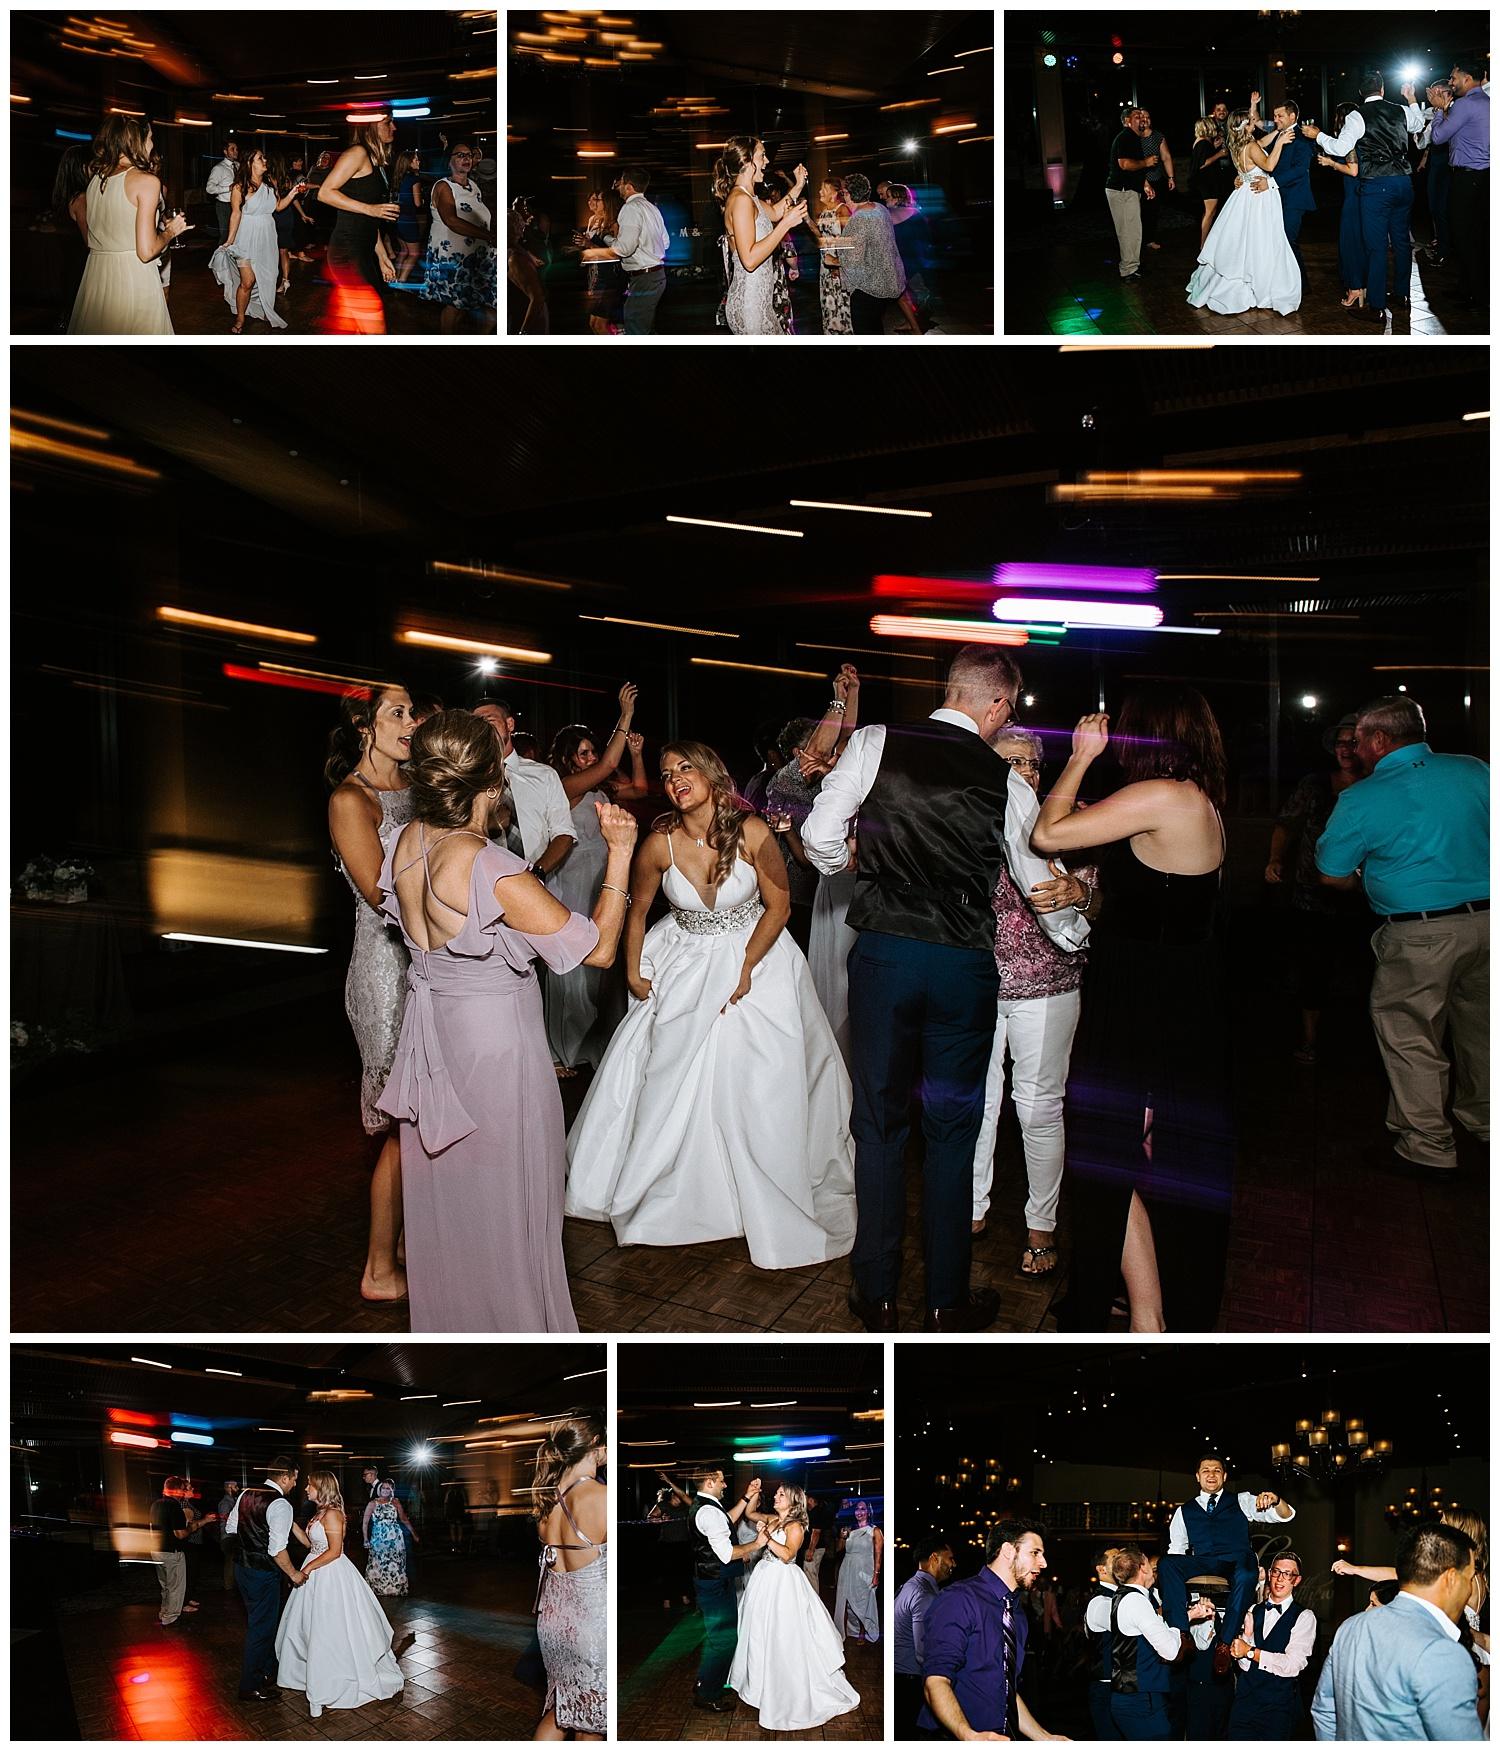 Destination-Wedding-Photographer-in-NEPA-Palmerton-PA_0033.jpg